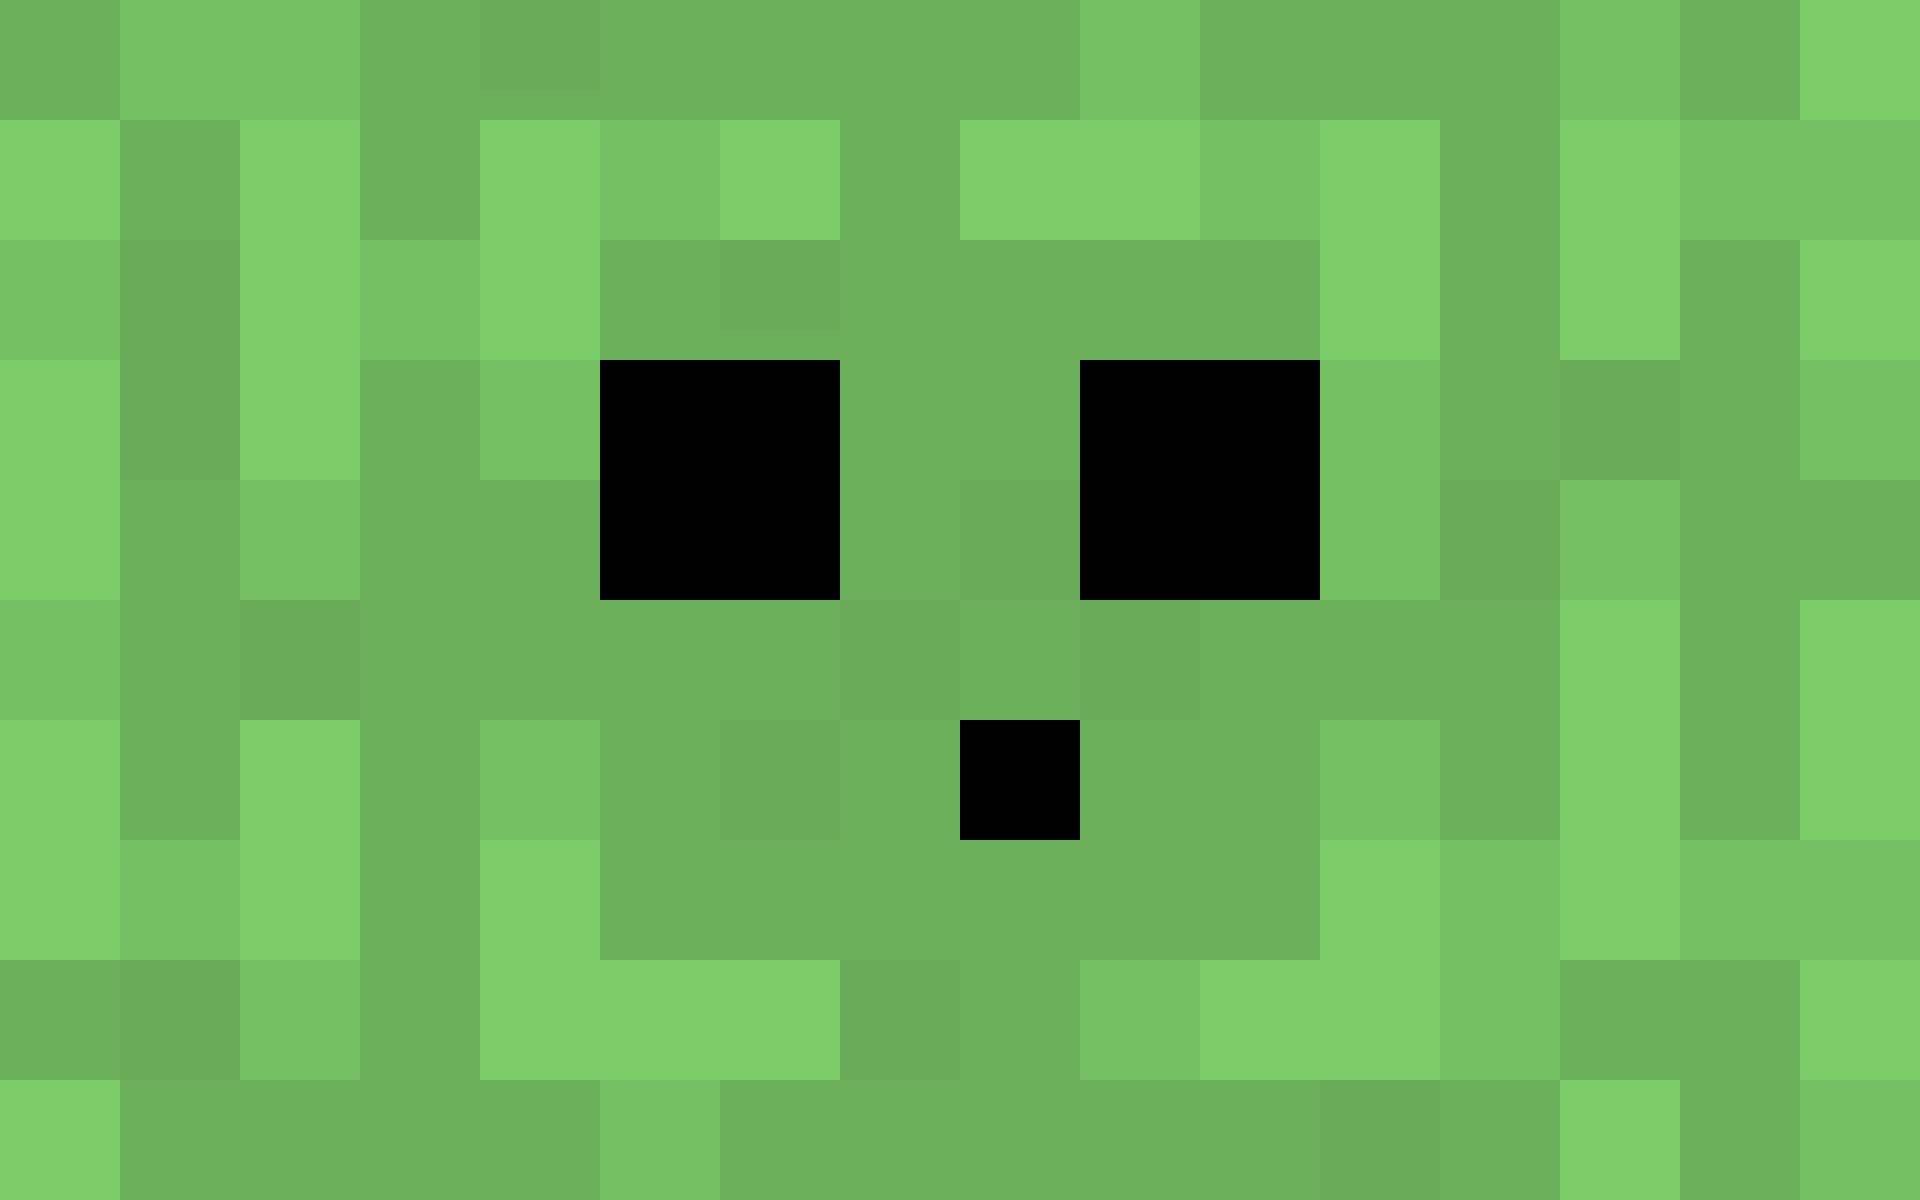 Minecraft Creeper Iphone Backgrounds HD | PixelsTalk.Net